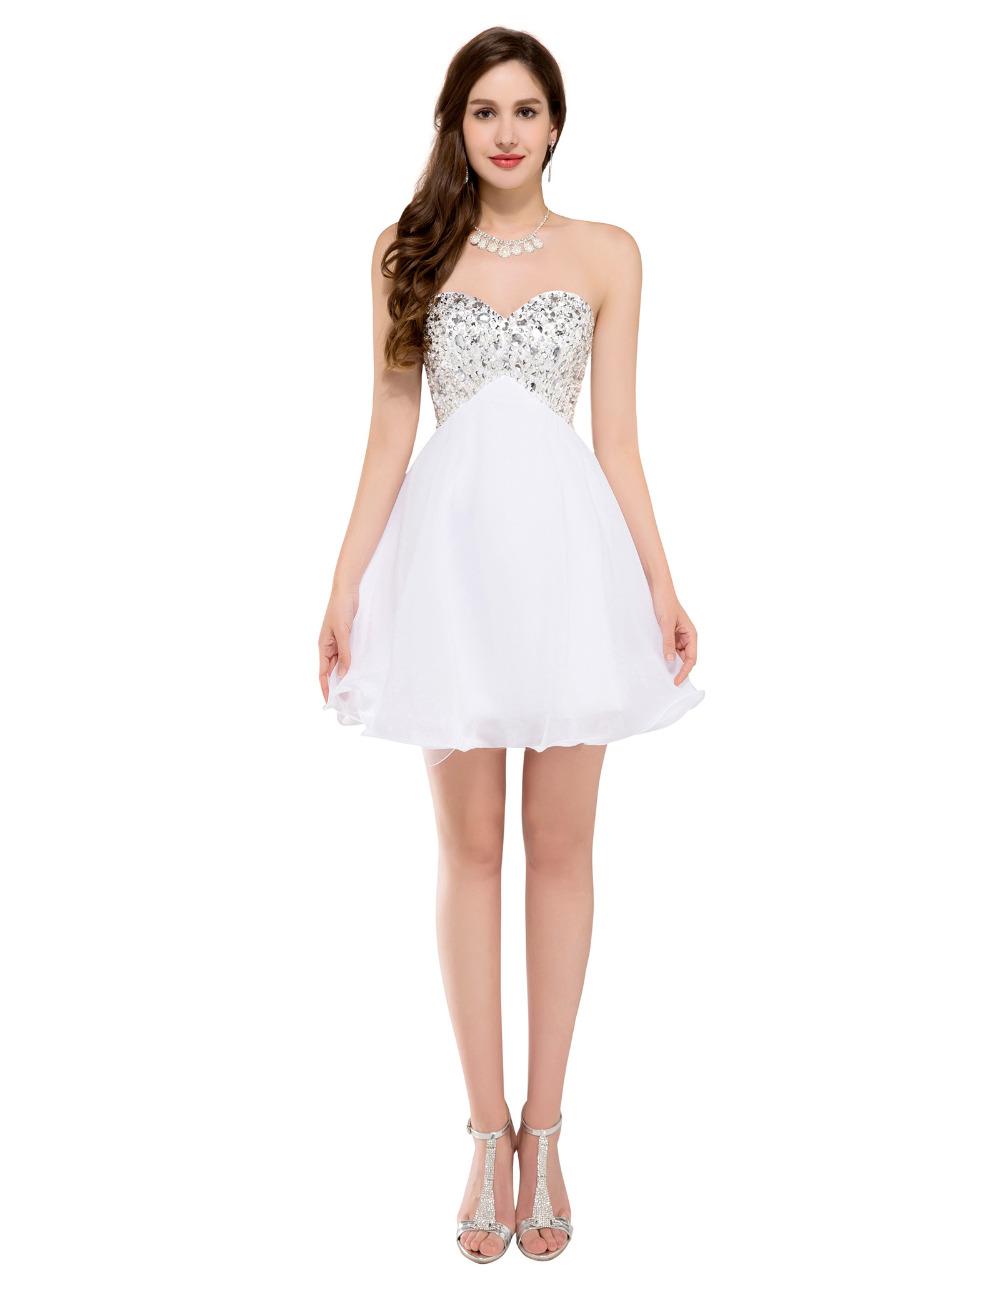 Short Black Prom Dresses Under 100